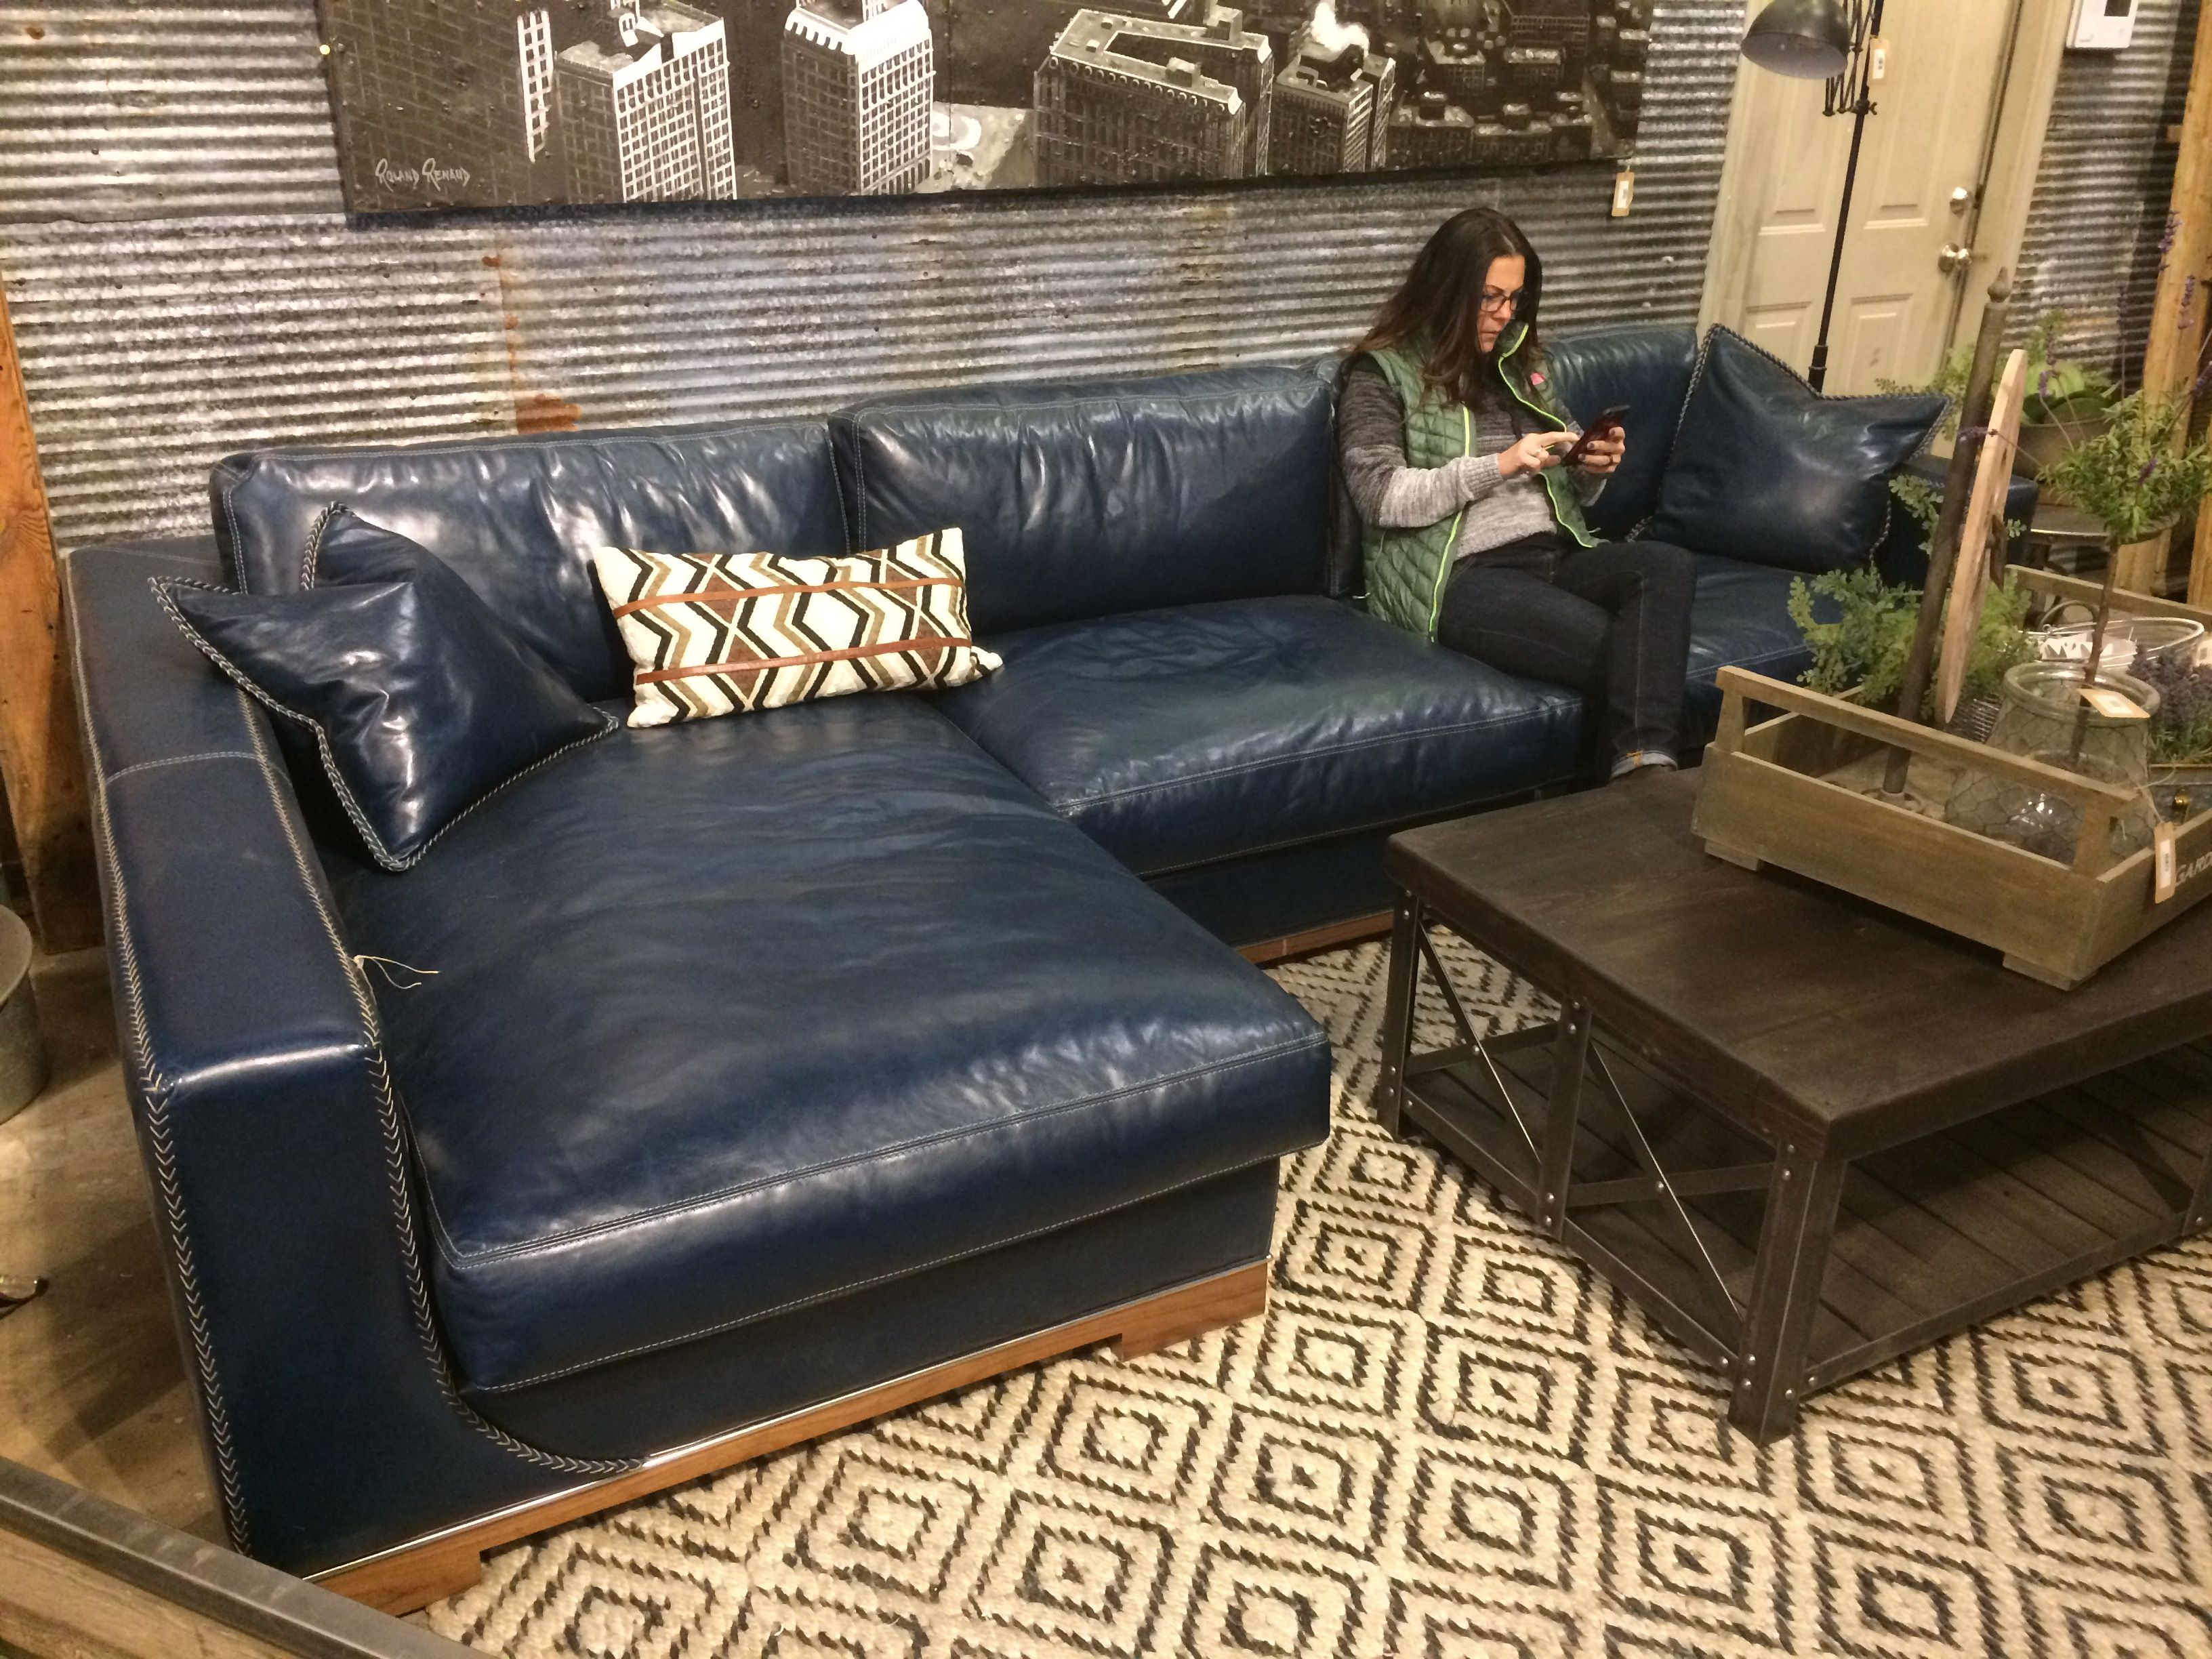 Urban Farmhouse Market Okc Blue Leather Couch Need Blue Leather Couch Leather Couches Living Room Leather Couch Living Room Decor